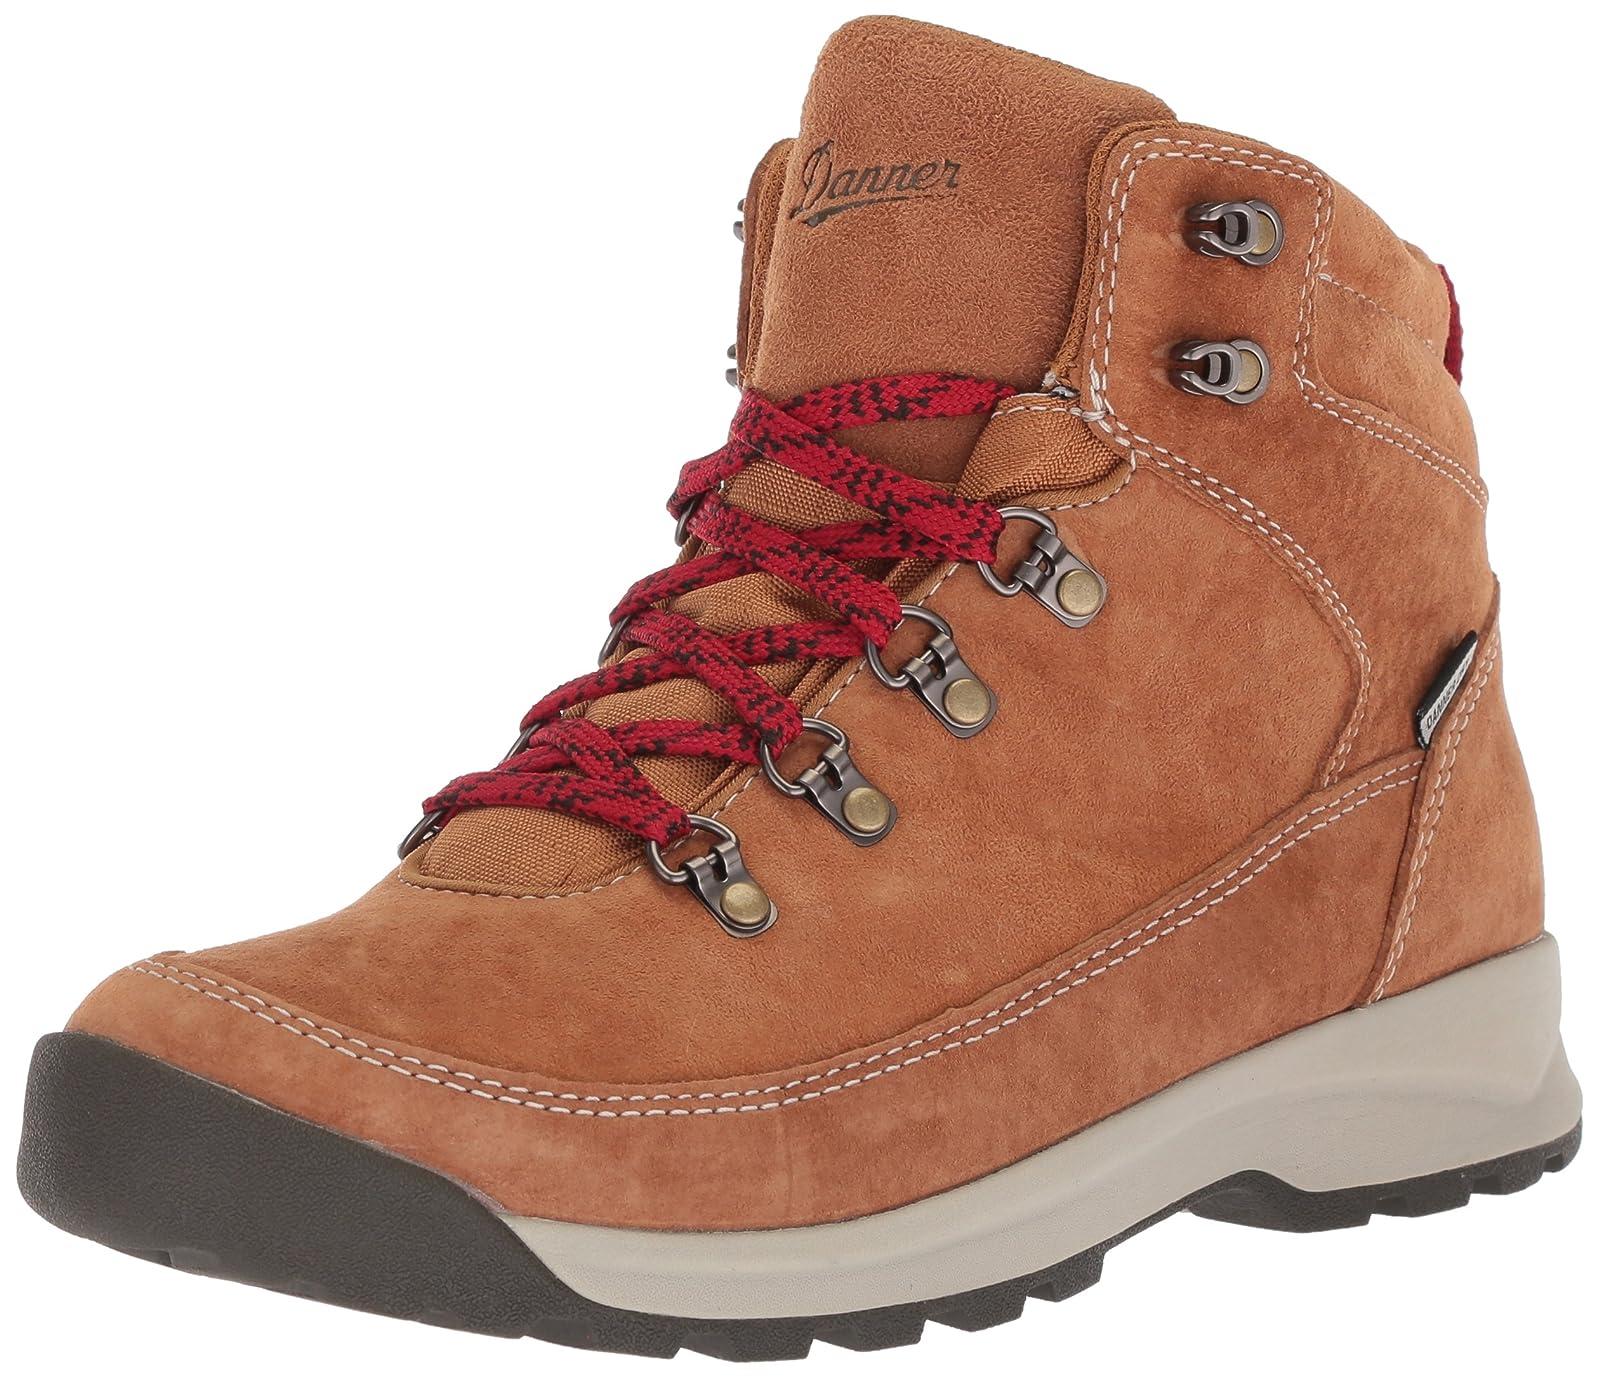 Danner Women's Adrika Hiker Hiking Boot 2 M US Boy - 1